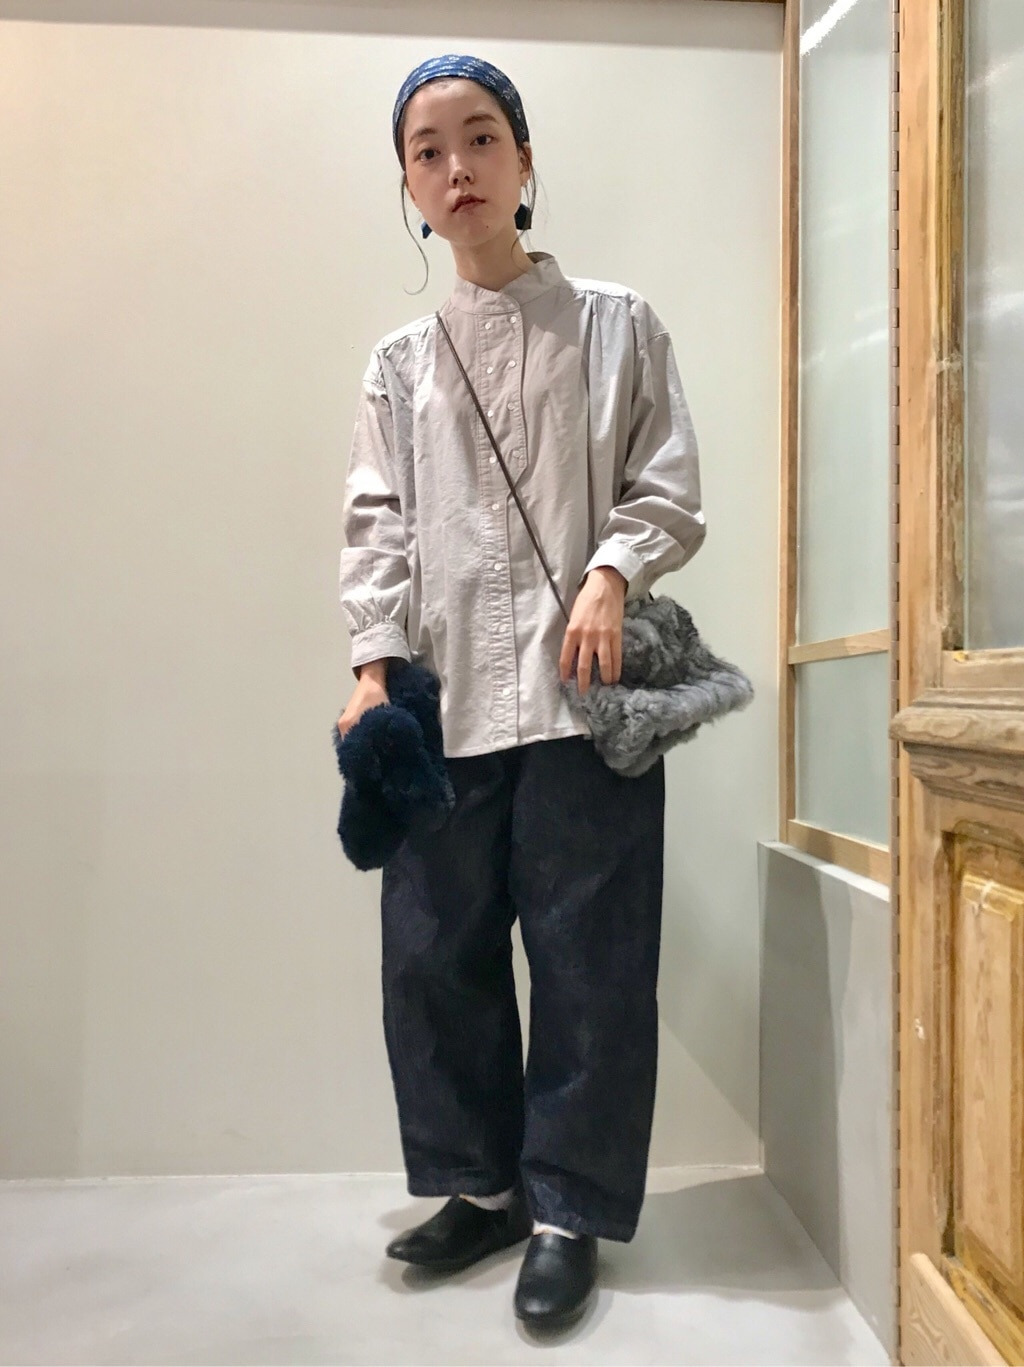 bulle de savon 渋谷スクランブルスクエア 身長:153cm 2020.09.07